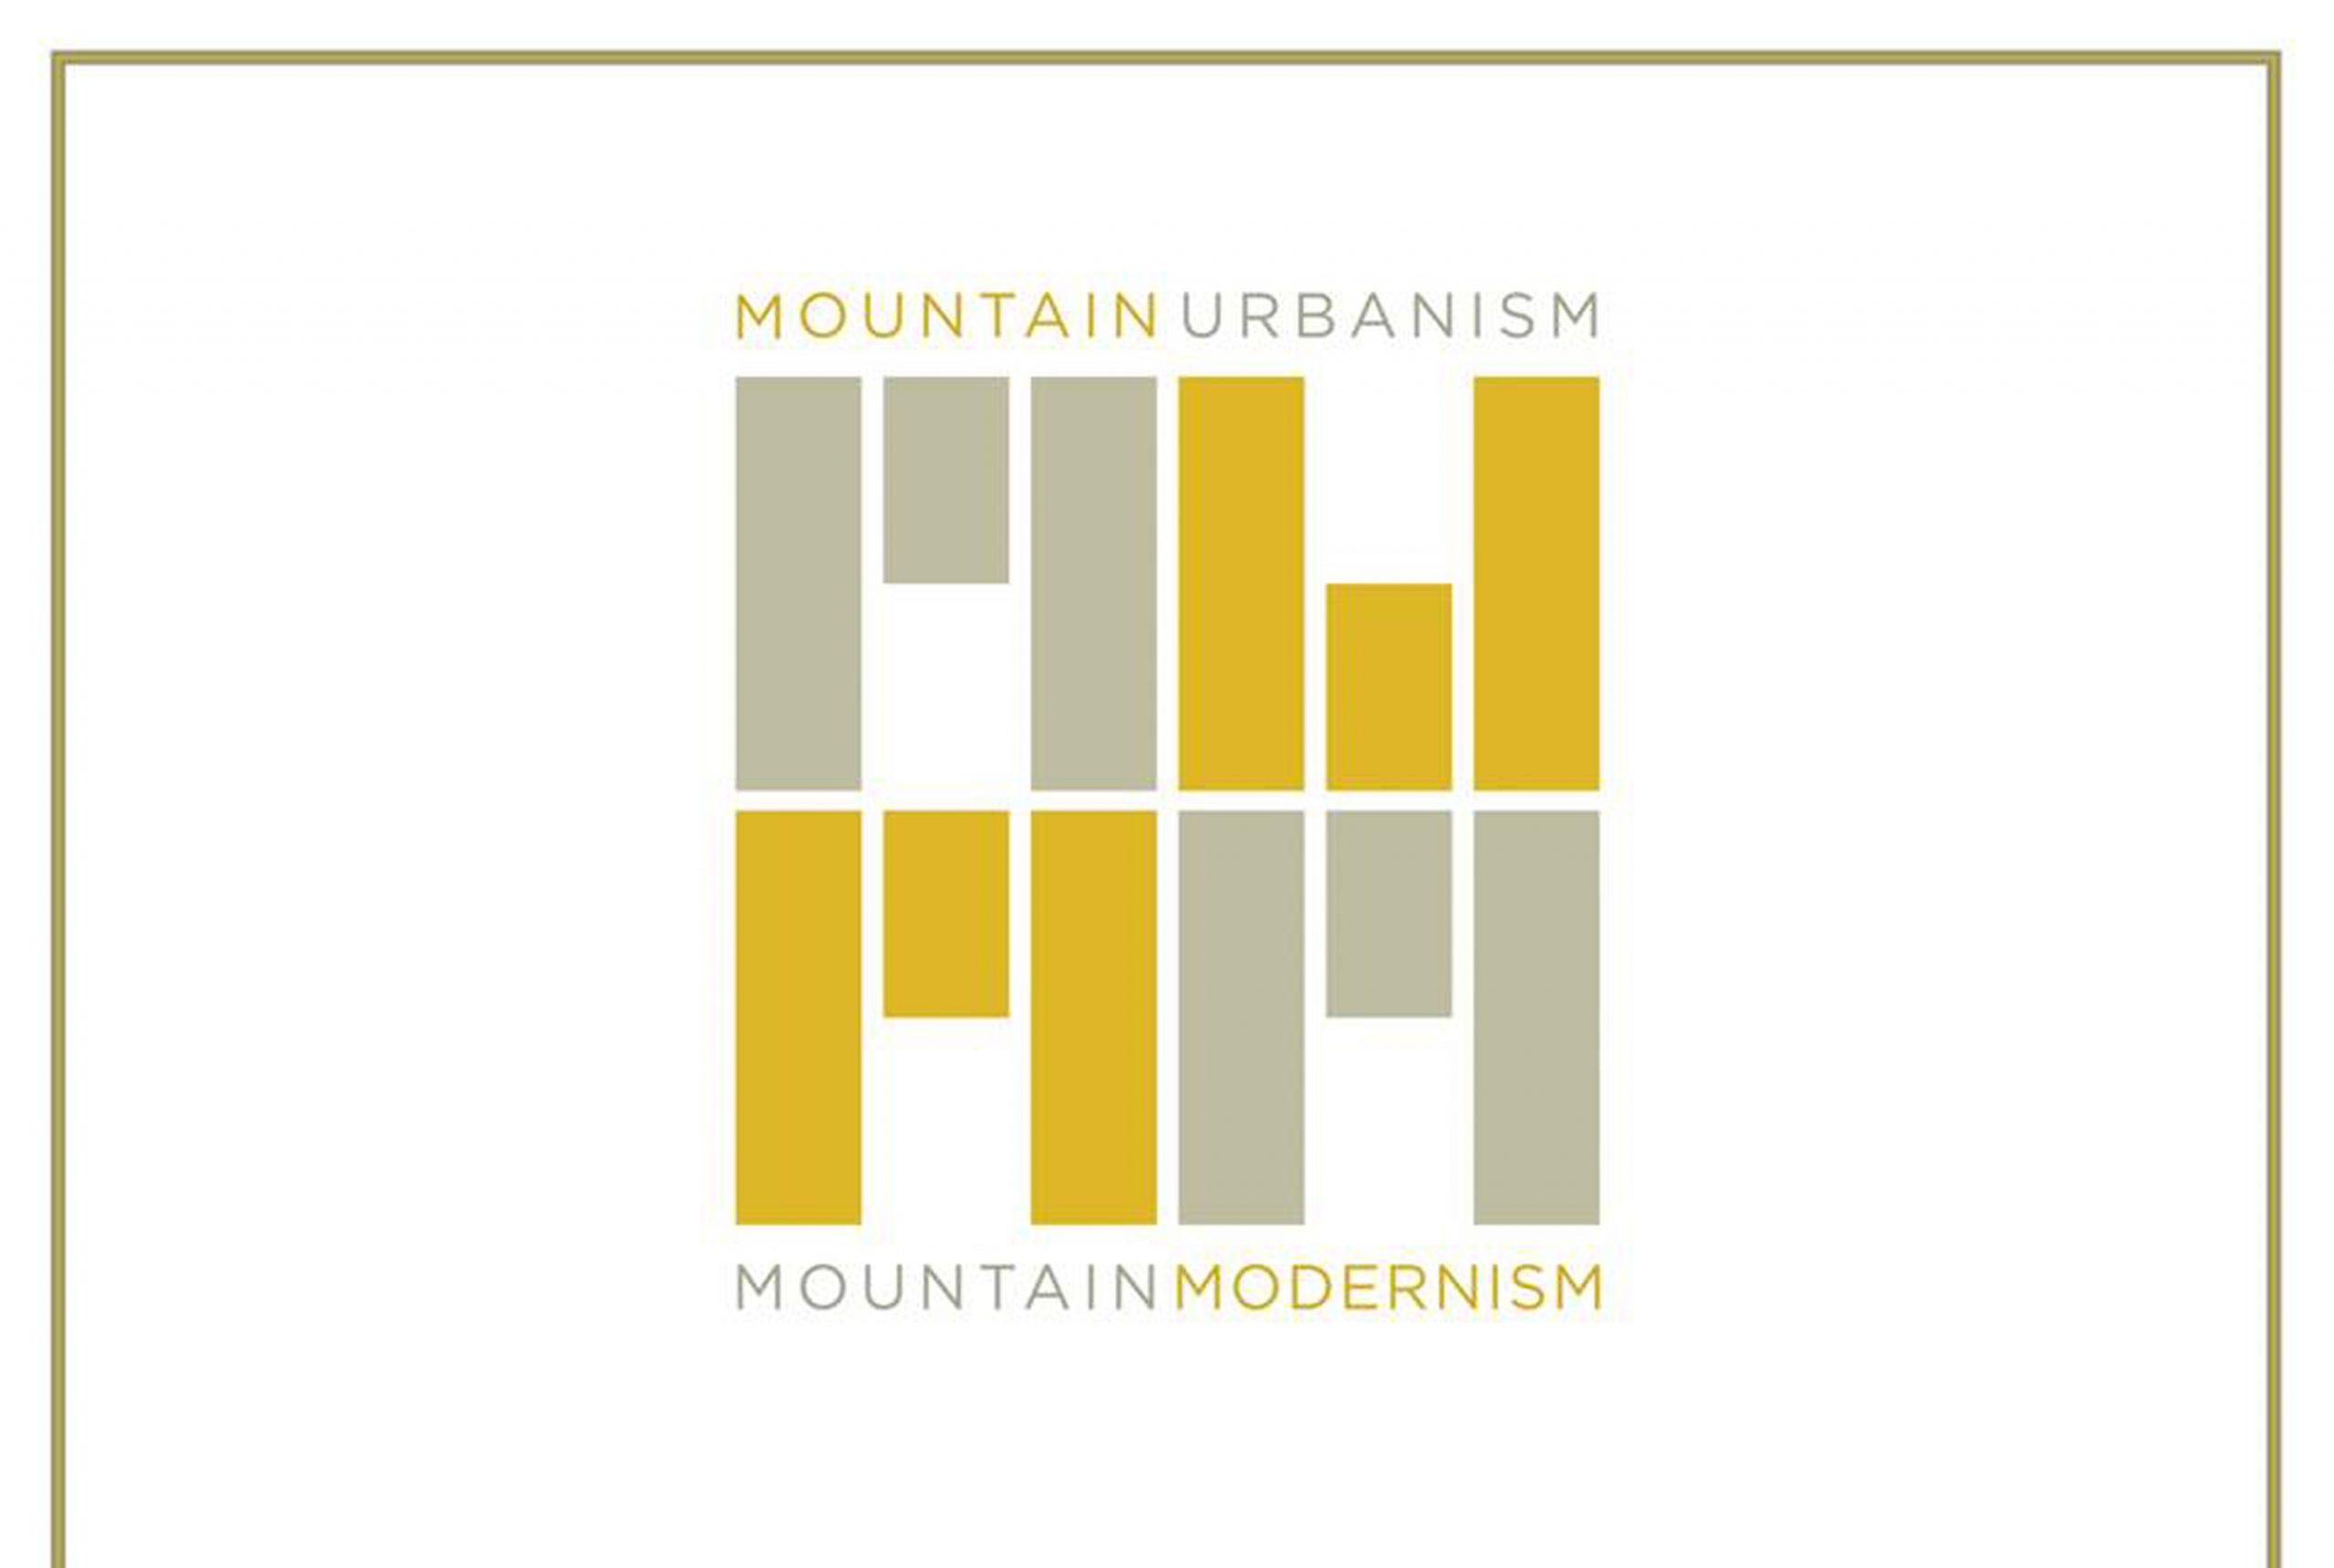 Mountain Modernism, Mayor's symposium on Thursday, Feb. 13, 2014.